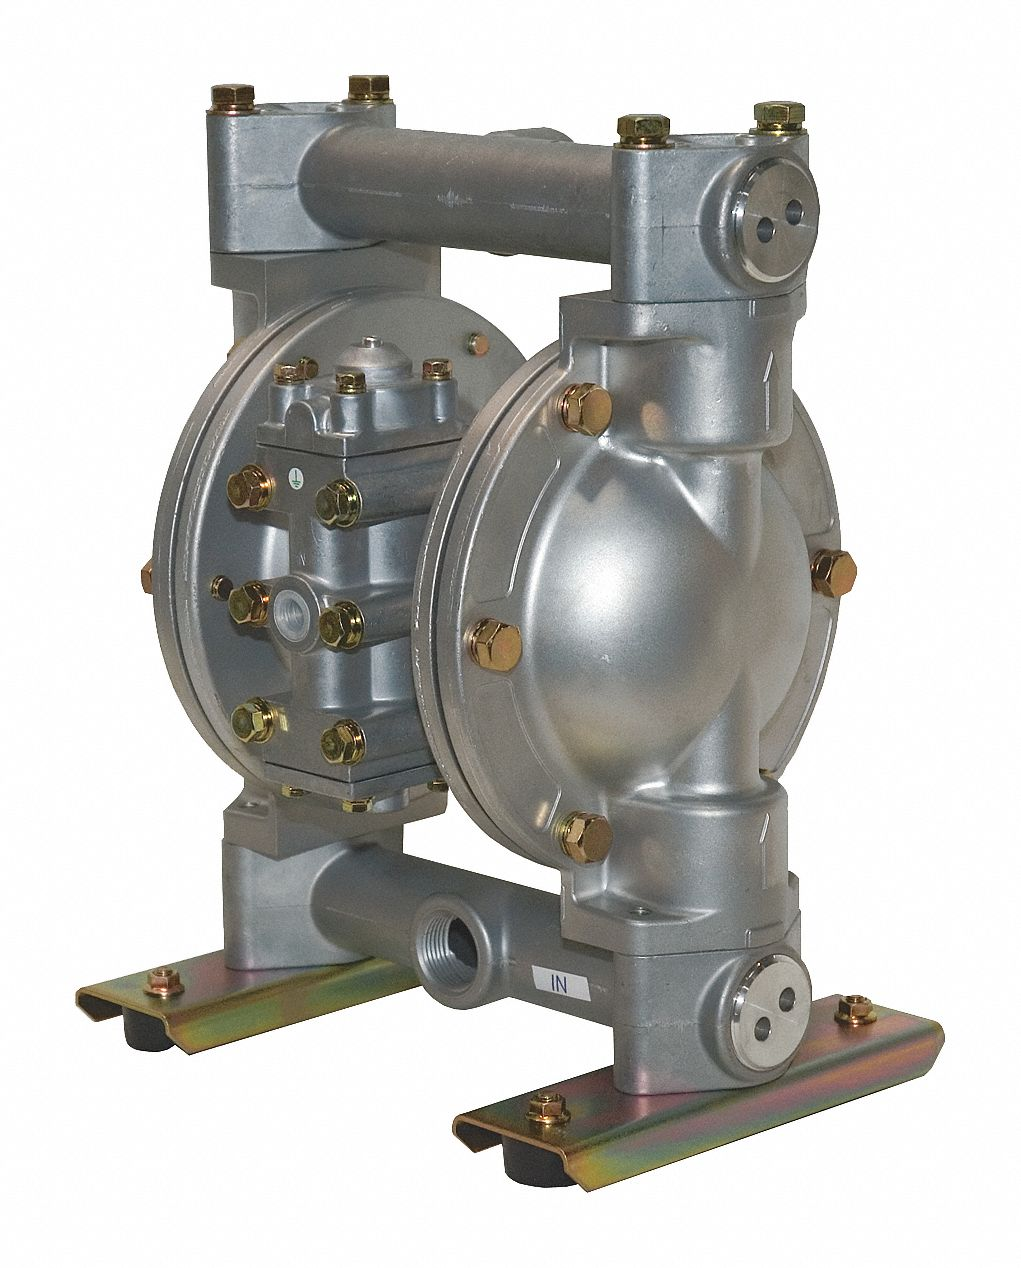 Dayton Double Diaphragm Pump 35 Gpm Max Flow Ptfe Single Manifold Connection 1 In 6py55 6py55 Grainger